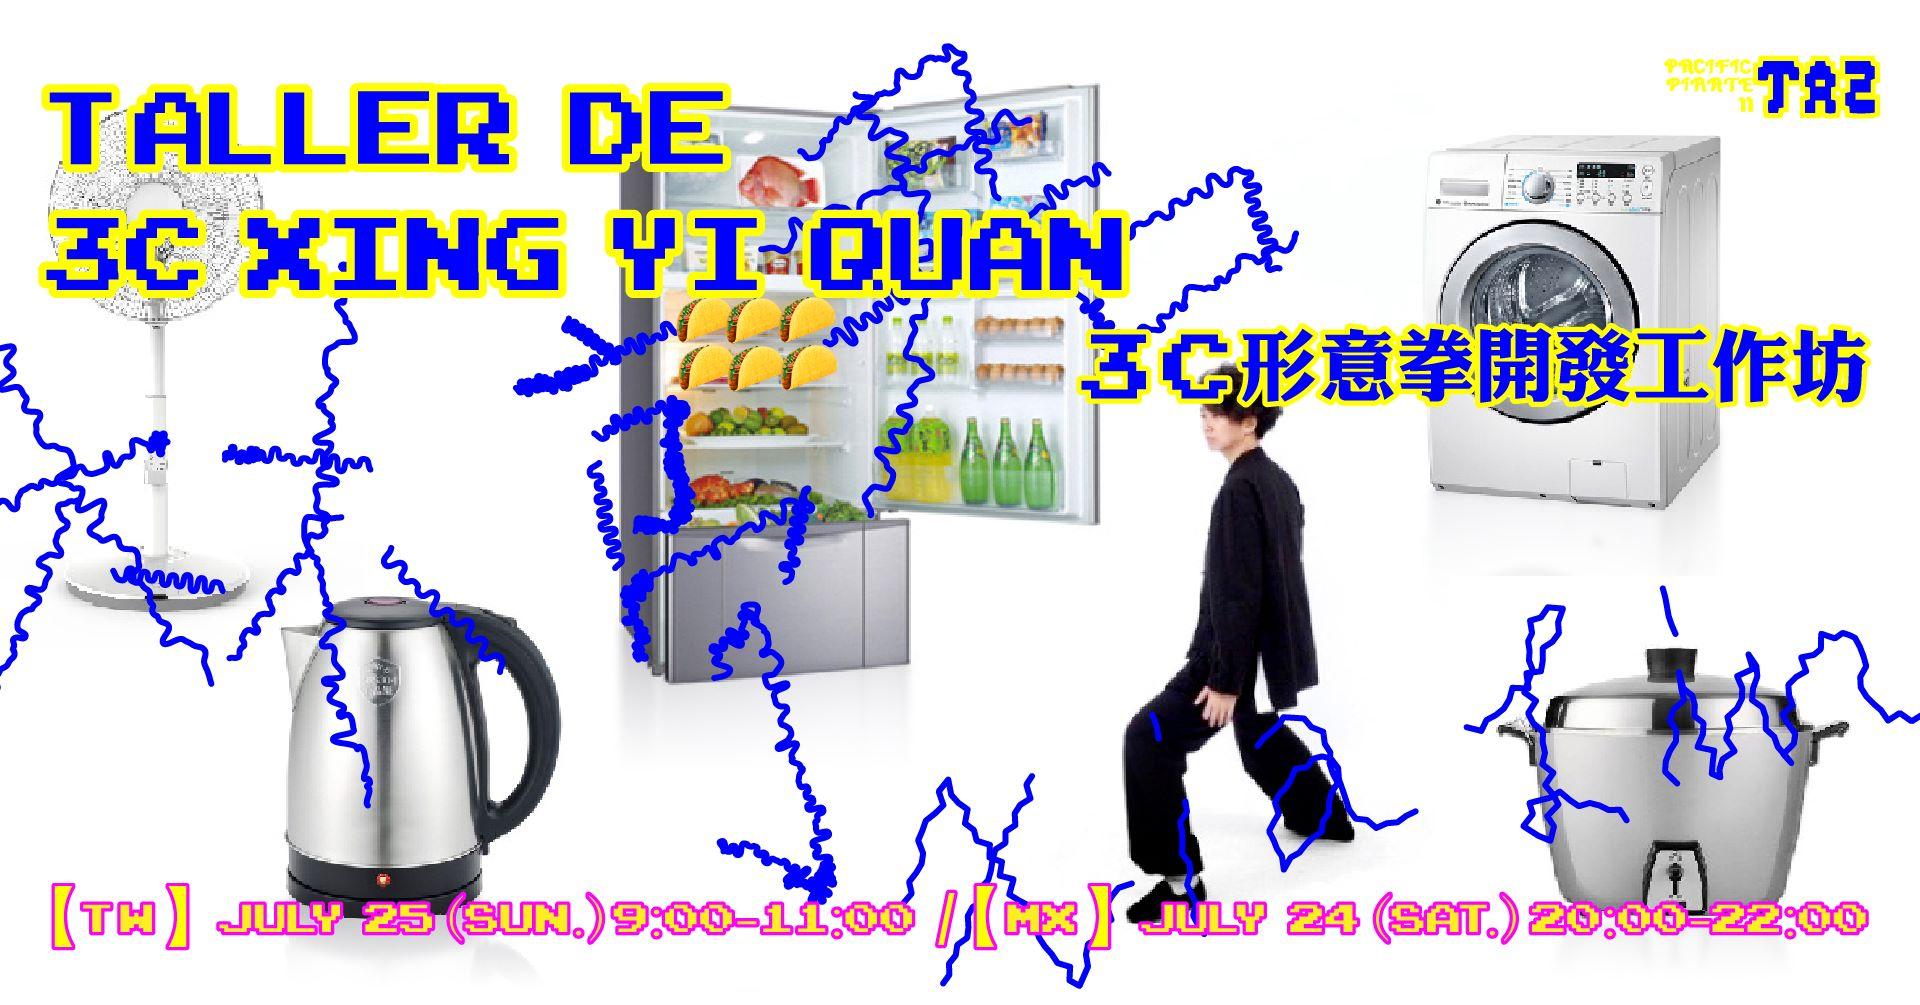 PP#2:TAZ【Performance / Actuar】Workshop of 3C Xing Yi Quan / Taller de 3C Xing Yi Quan Xia Lin